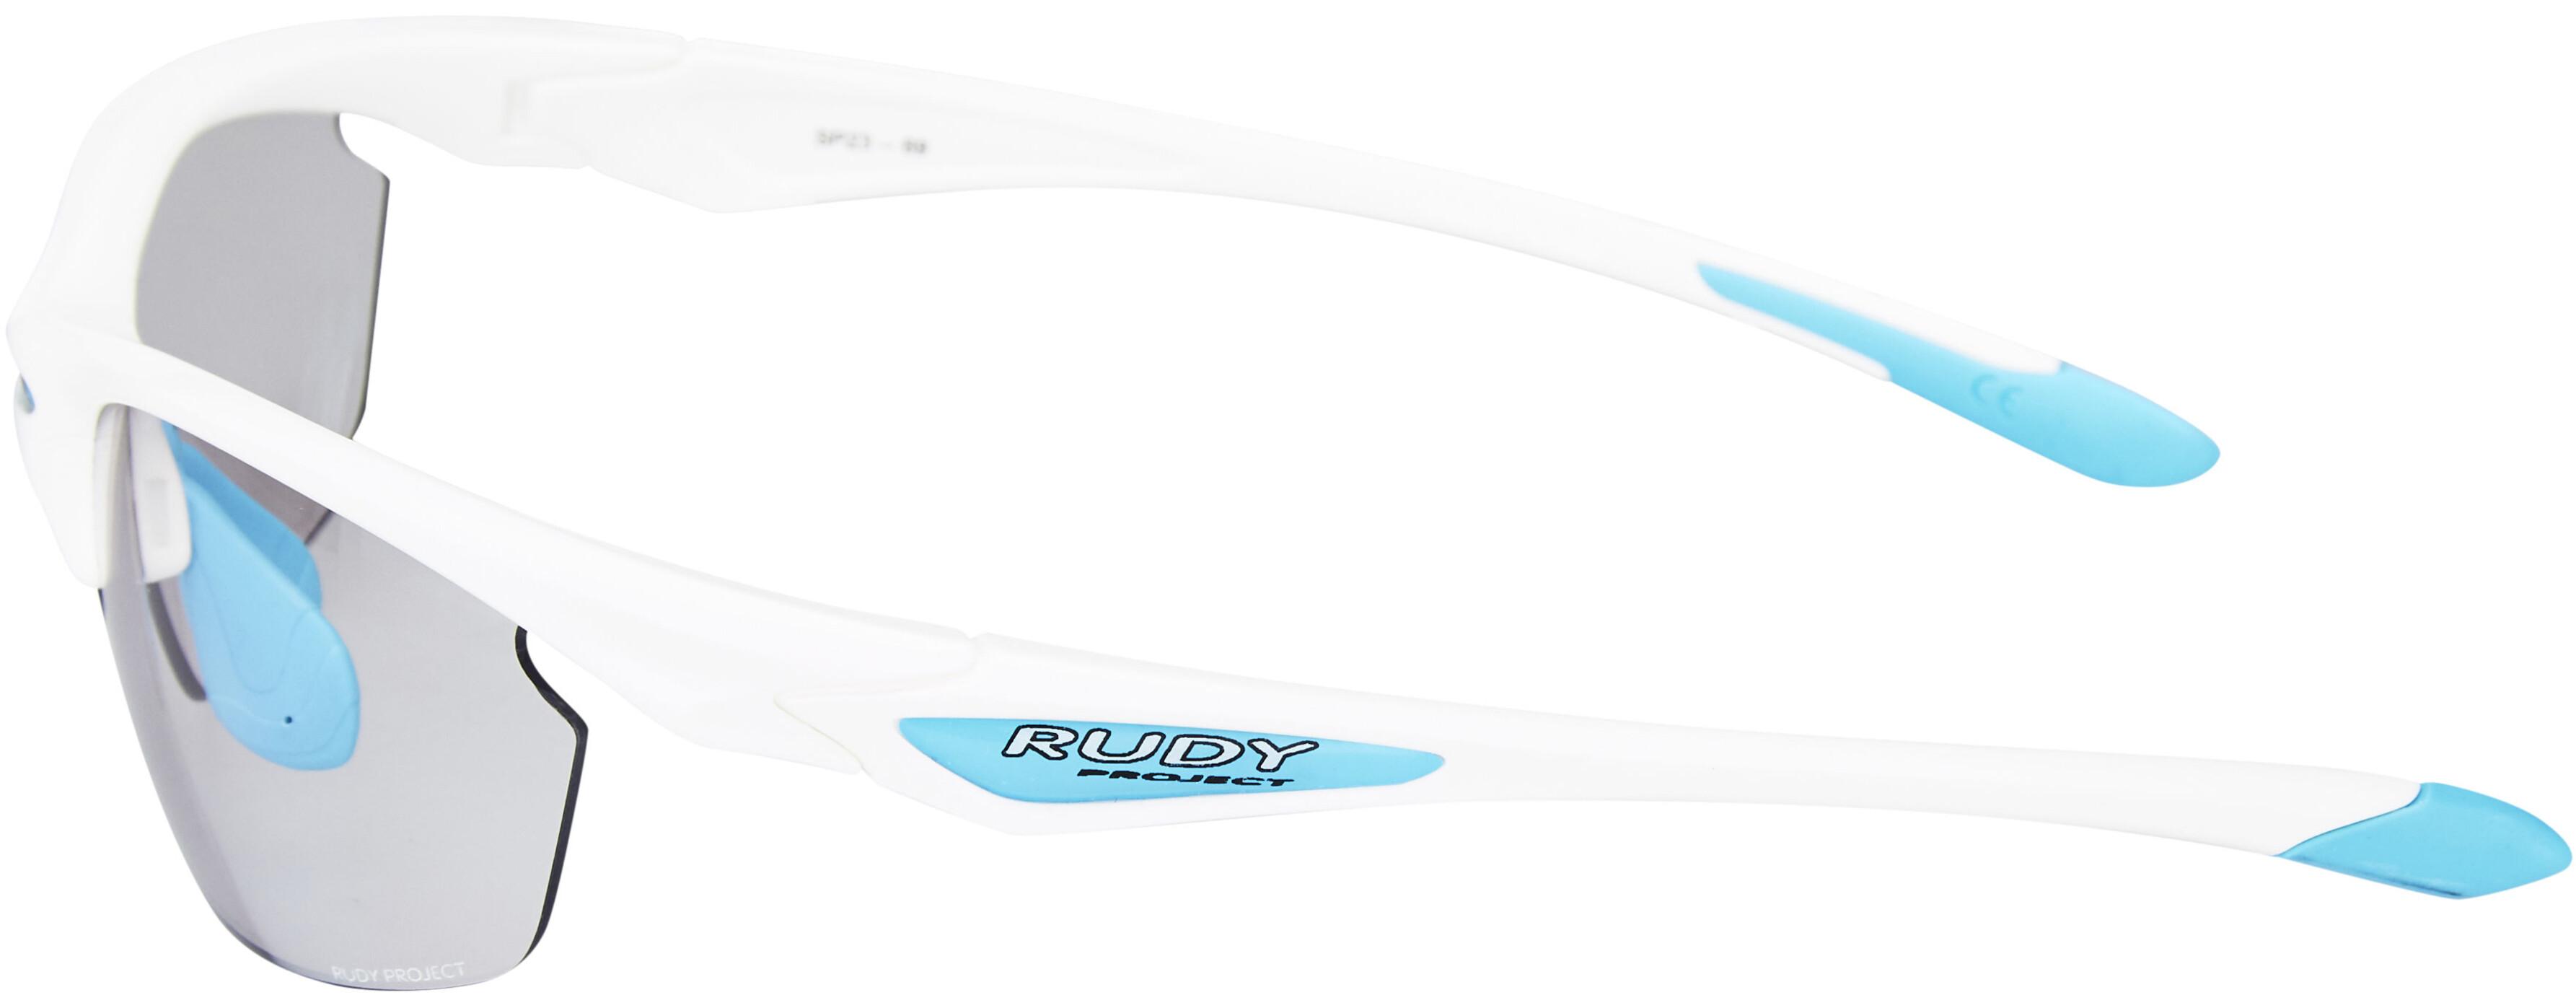 a695092edb480a Rudy Project Stratofly SX - Lunettes cyclisme - White Gloss Photoclear blanc